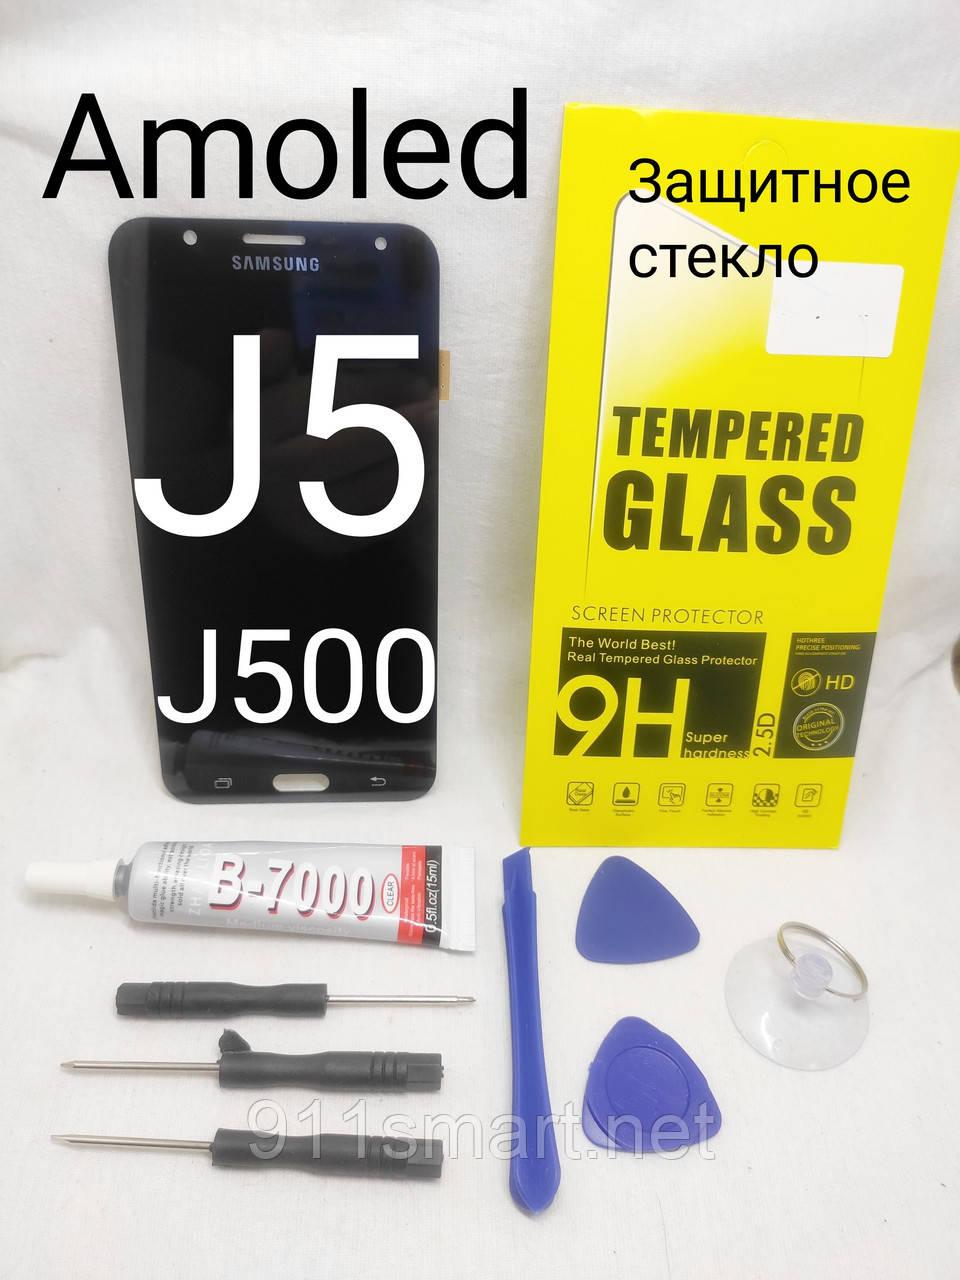 Дисплей + сенсор amoled LCD модуль Samsung J500H